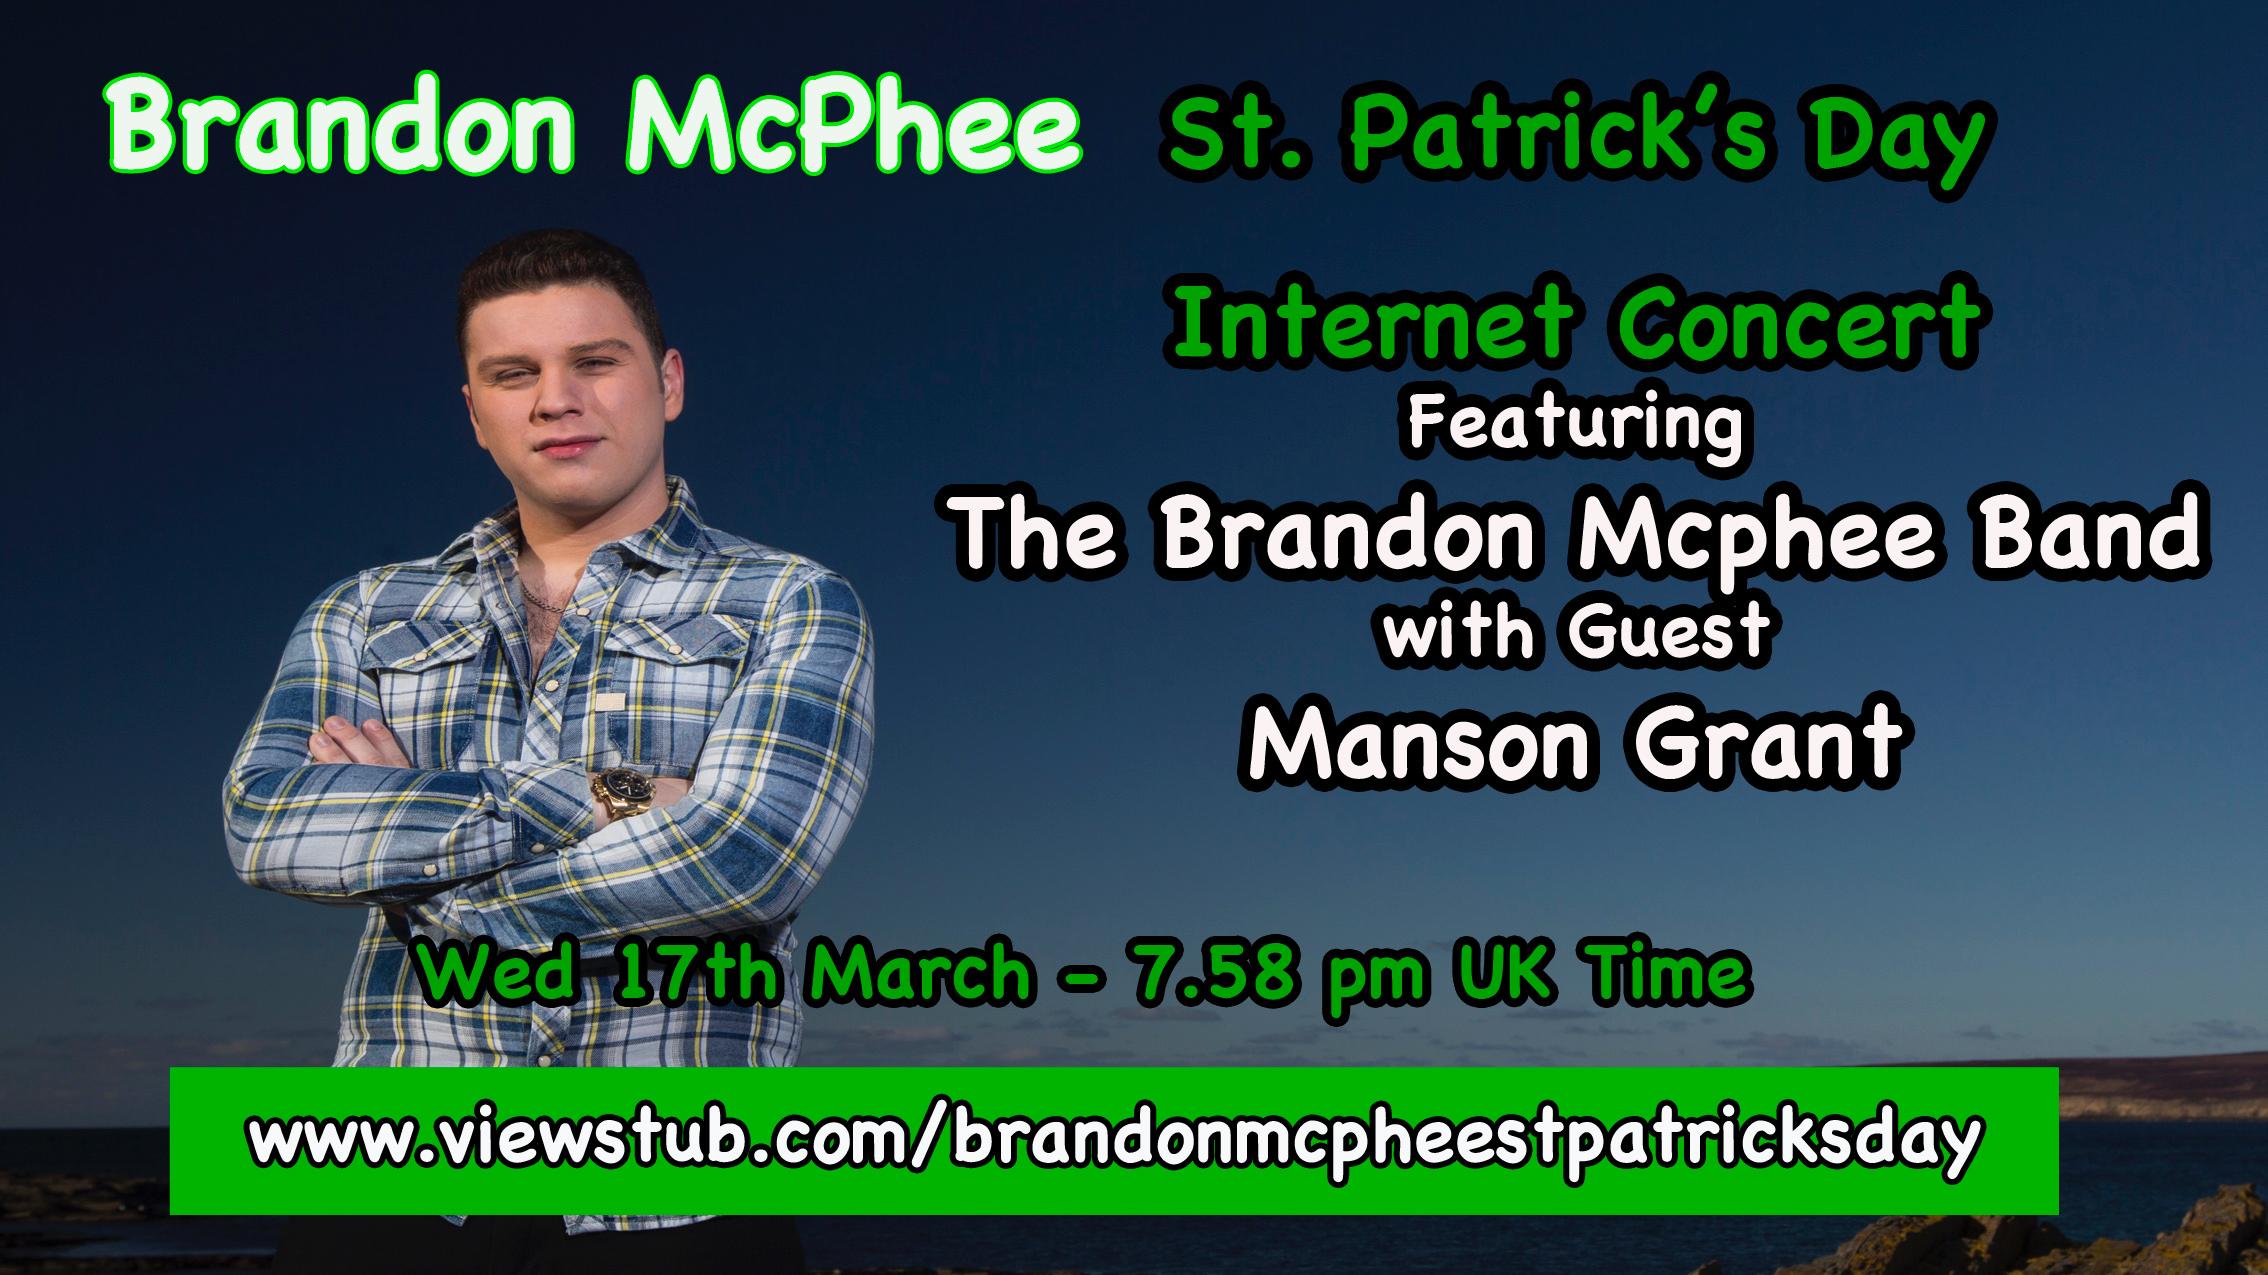 Photo for Brandon Mcphee St Patrick's Day Concert on ViewStub